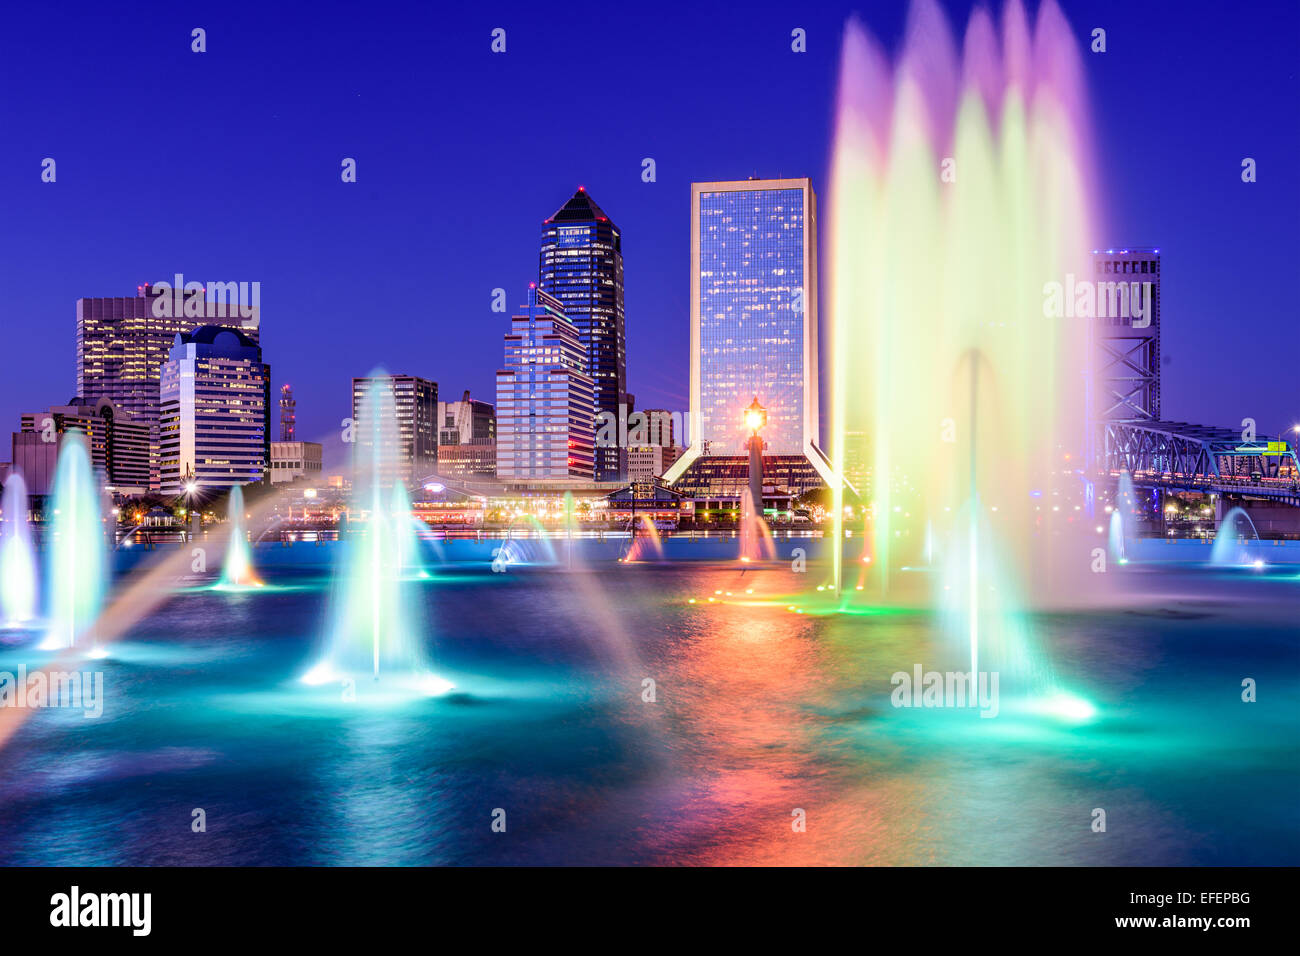 Jacksonville, Florida, USA skyline at the fountain. - Stock Image